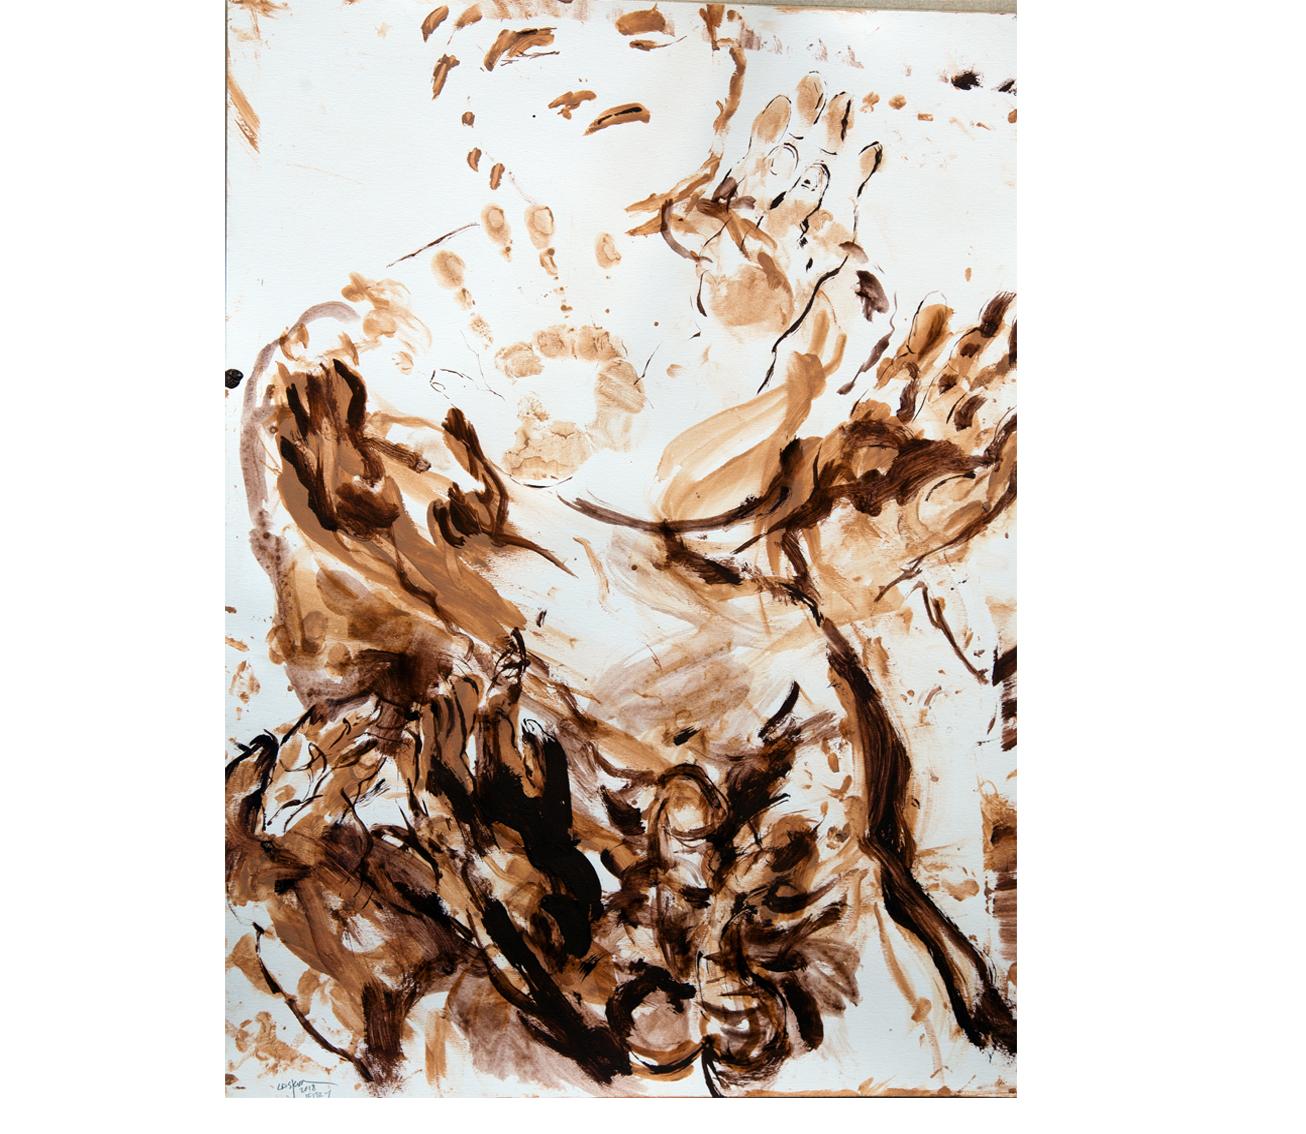 Terra on paper 4, 50x70 cm